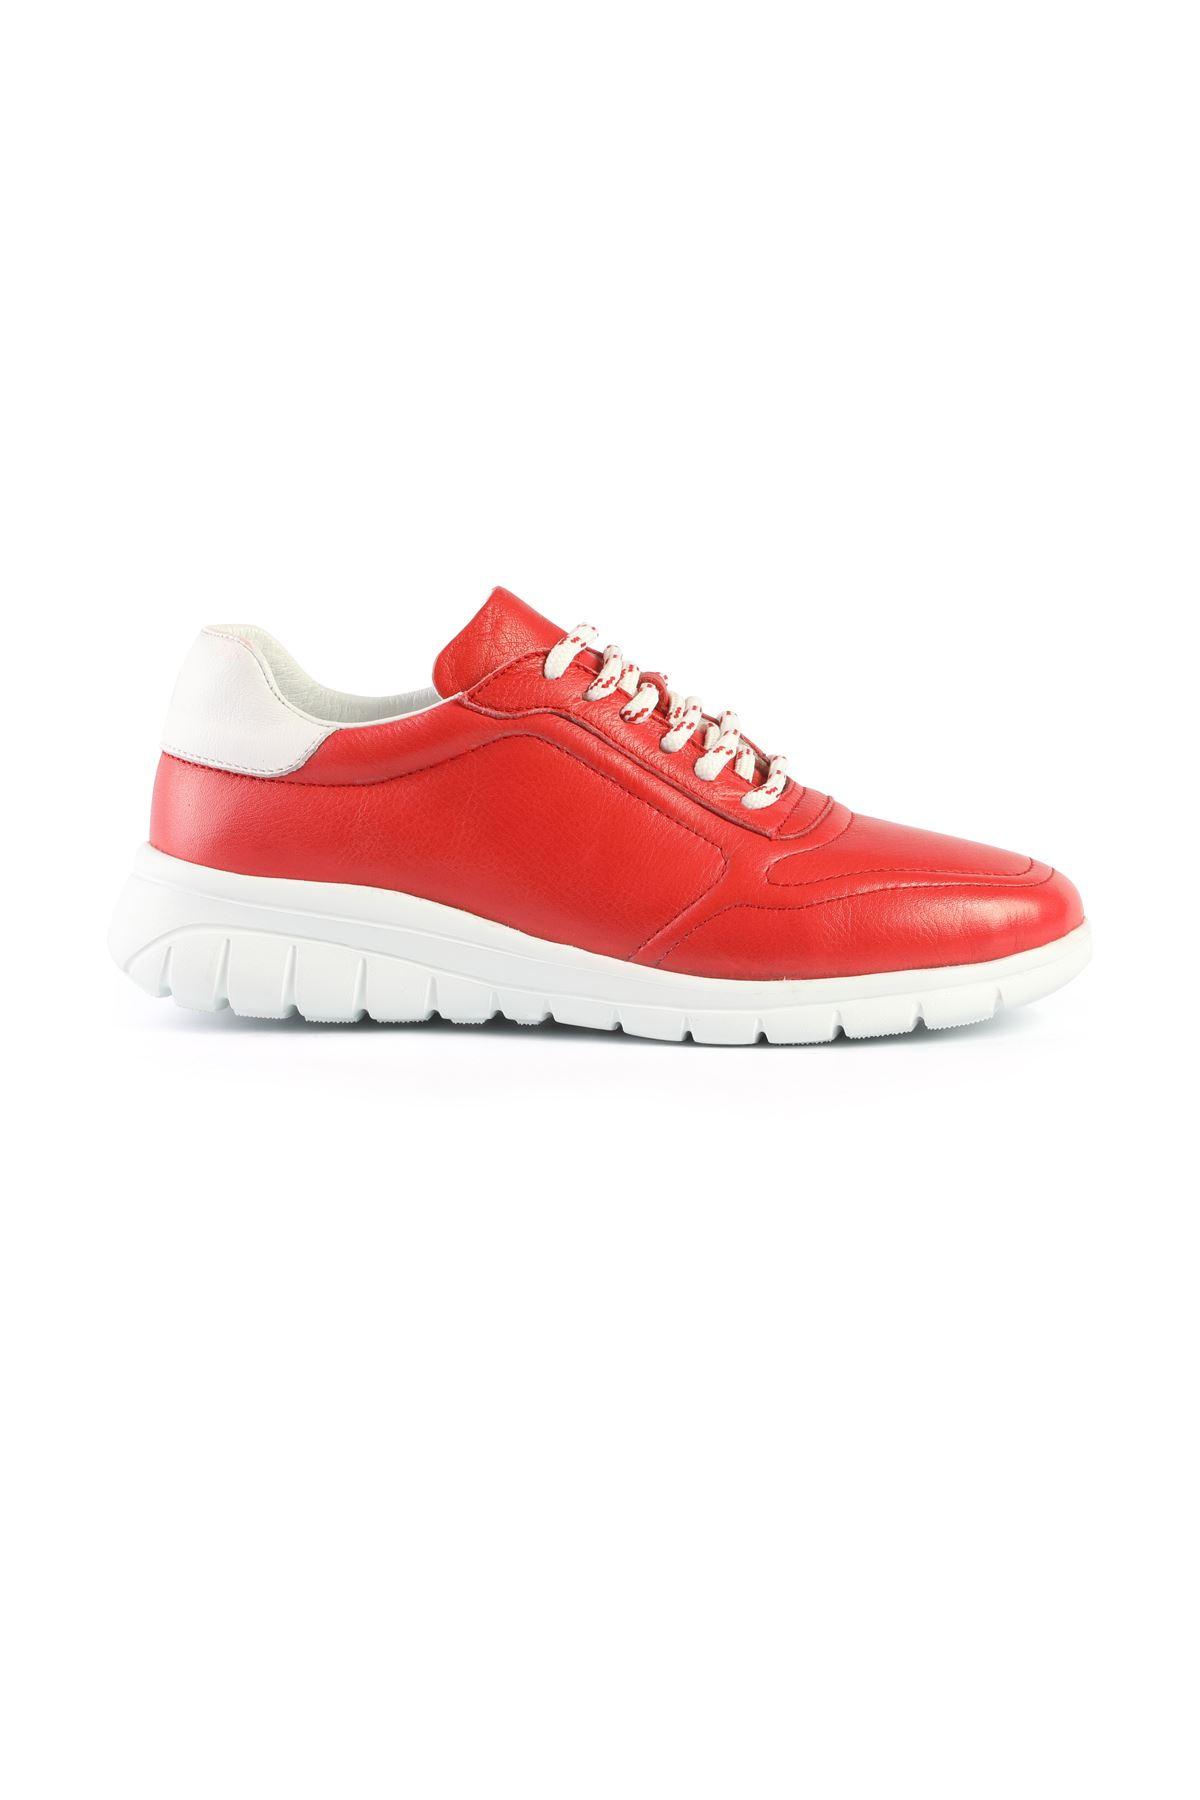 Libero LZ3389 Cream Sports Shoes